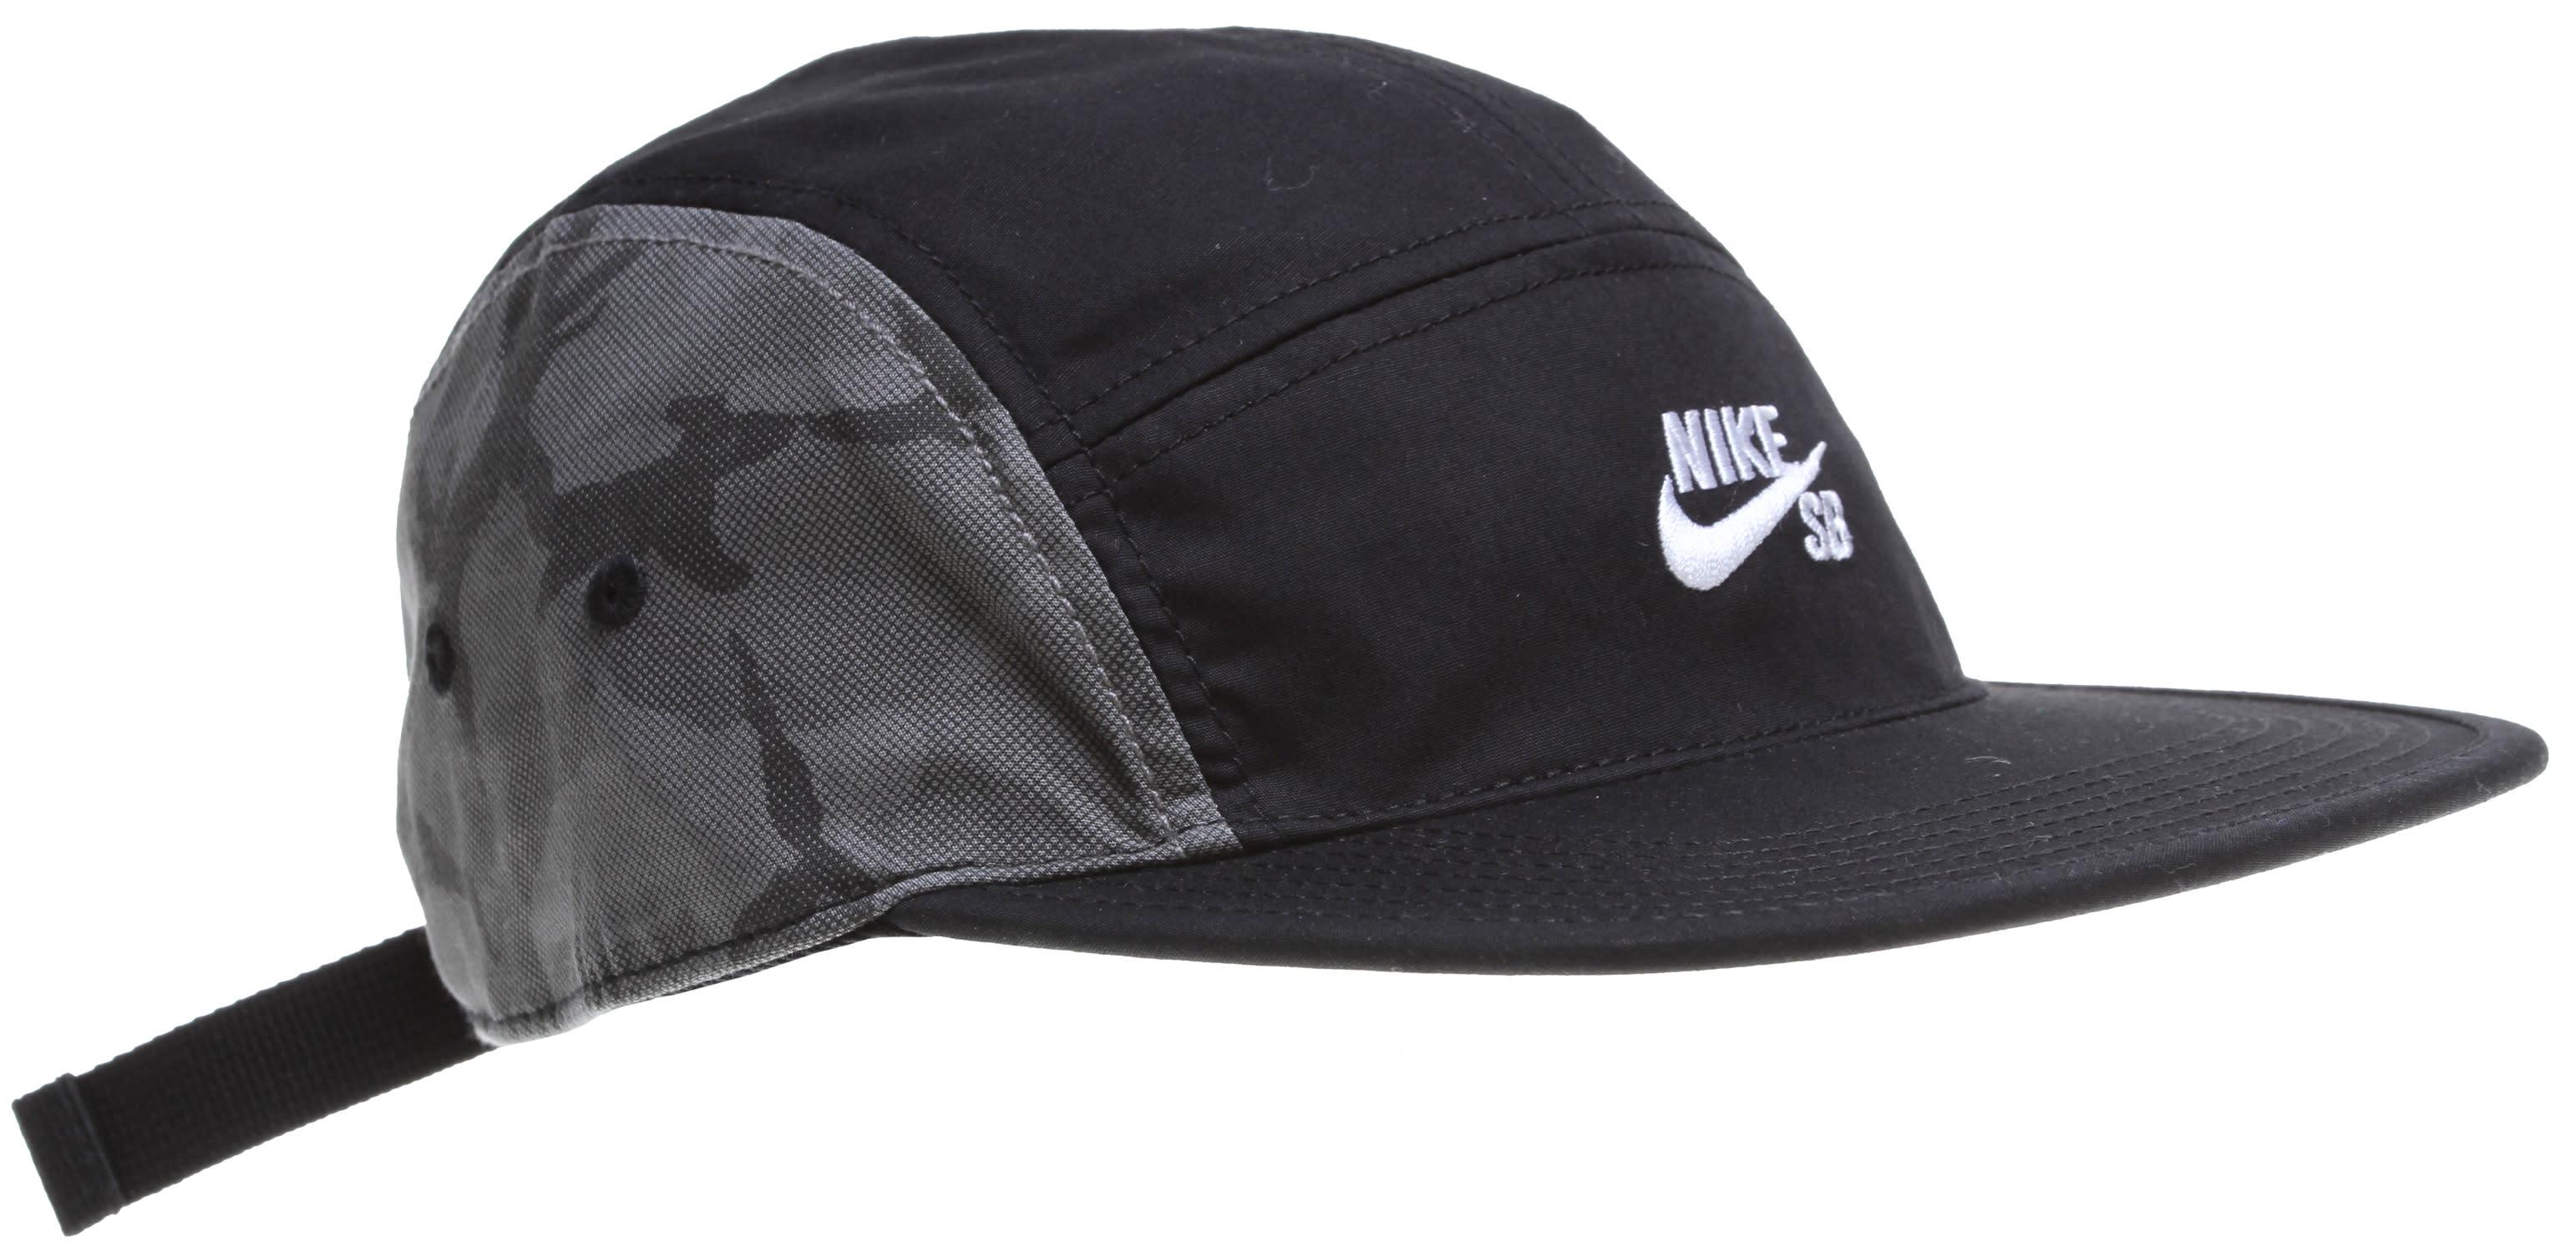 Nike SB Camo 5 Panel Cap - thumbnail 2 dfe9ca44d79